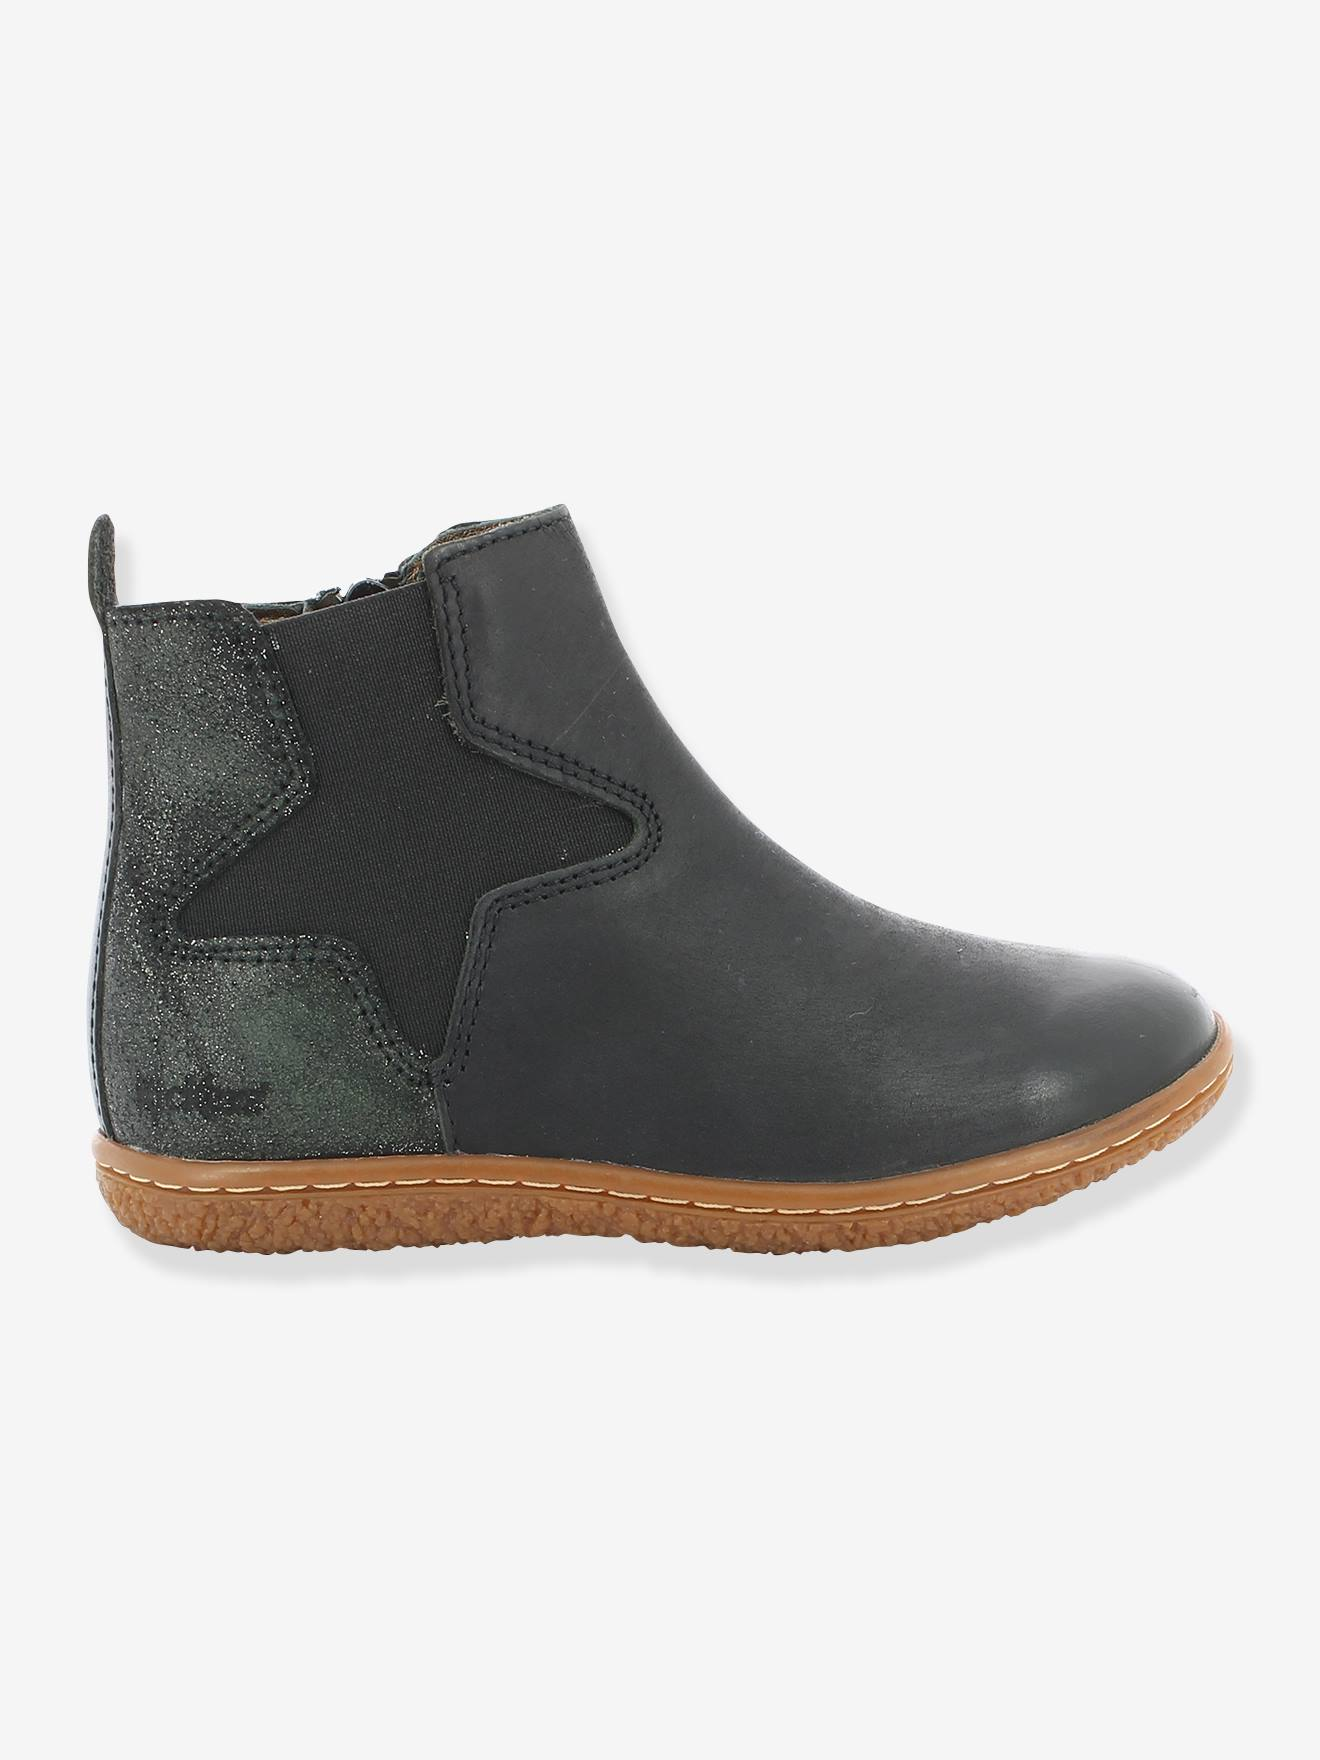 Boots fille Vermillon KICKERS® marine Kickers